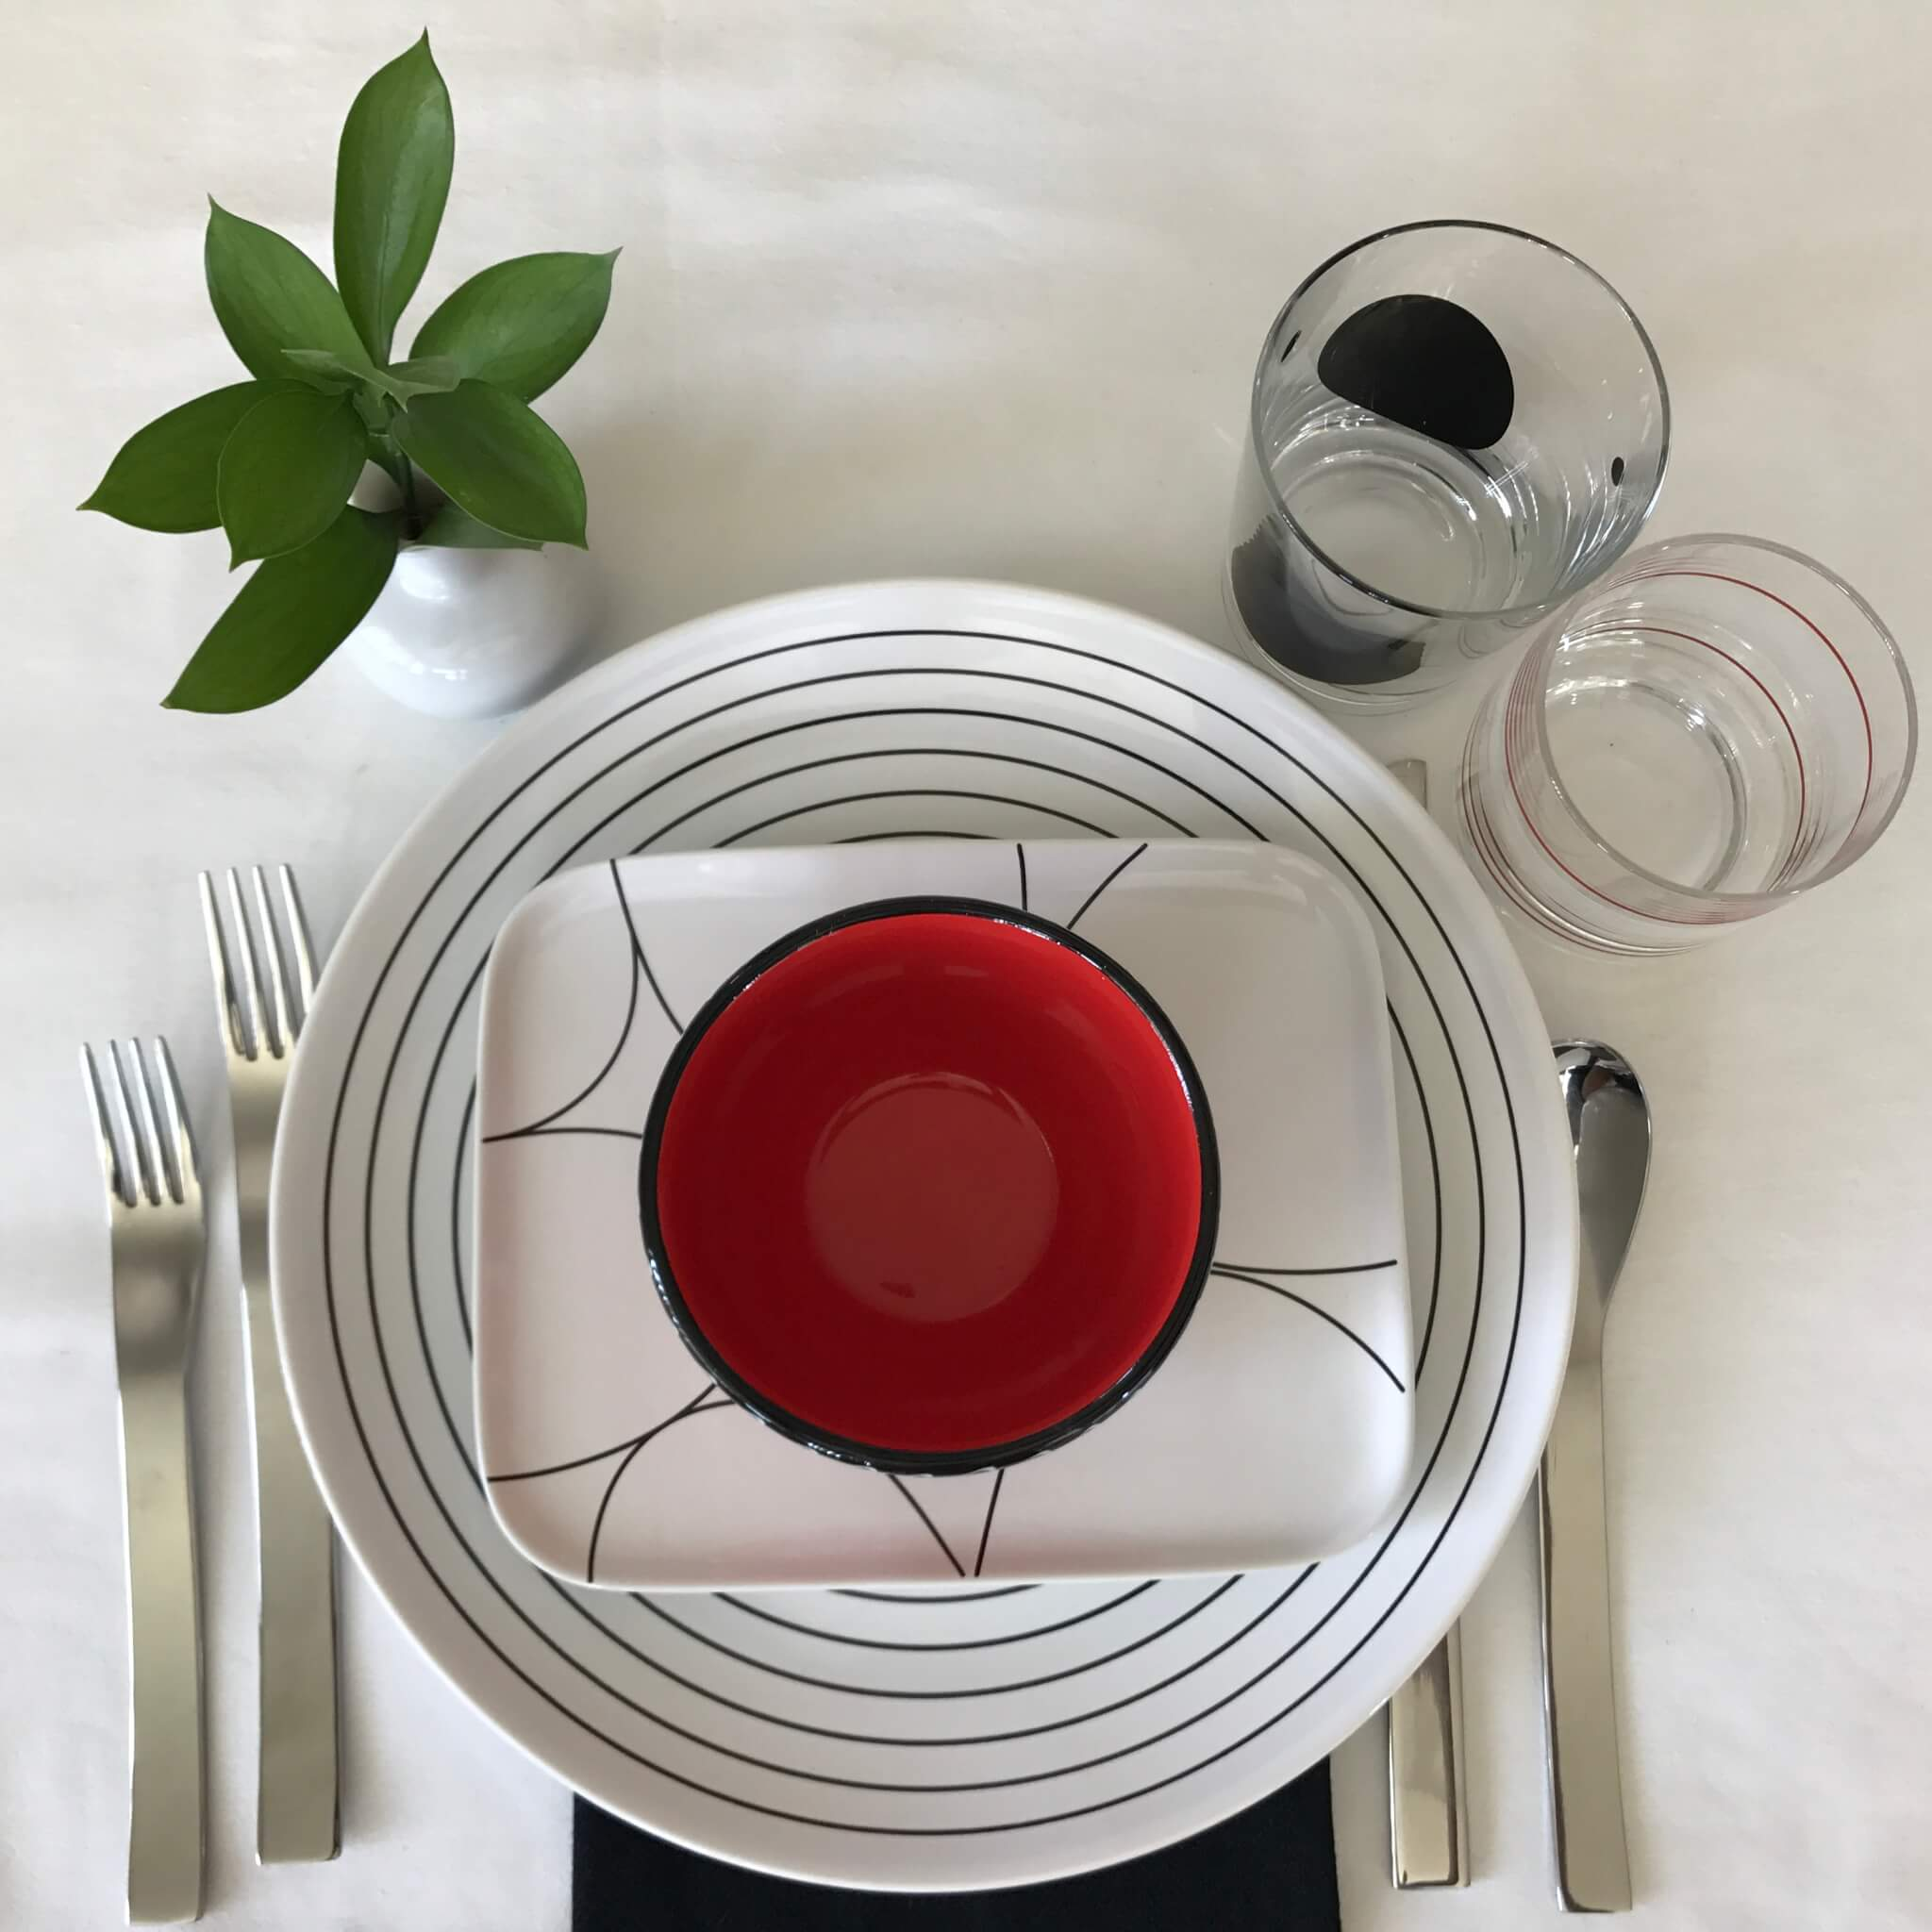 Tabletop Tuesday: Verve